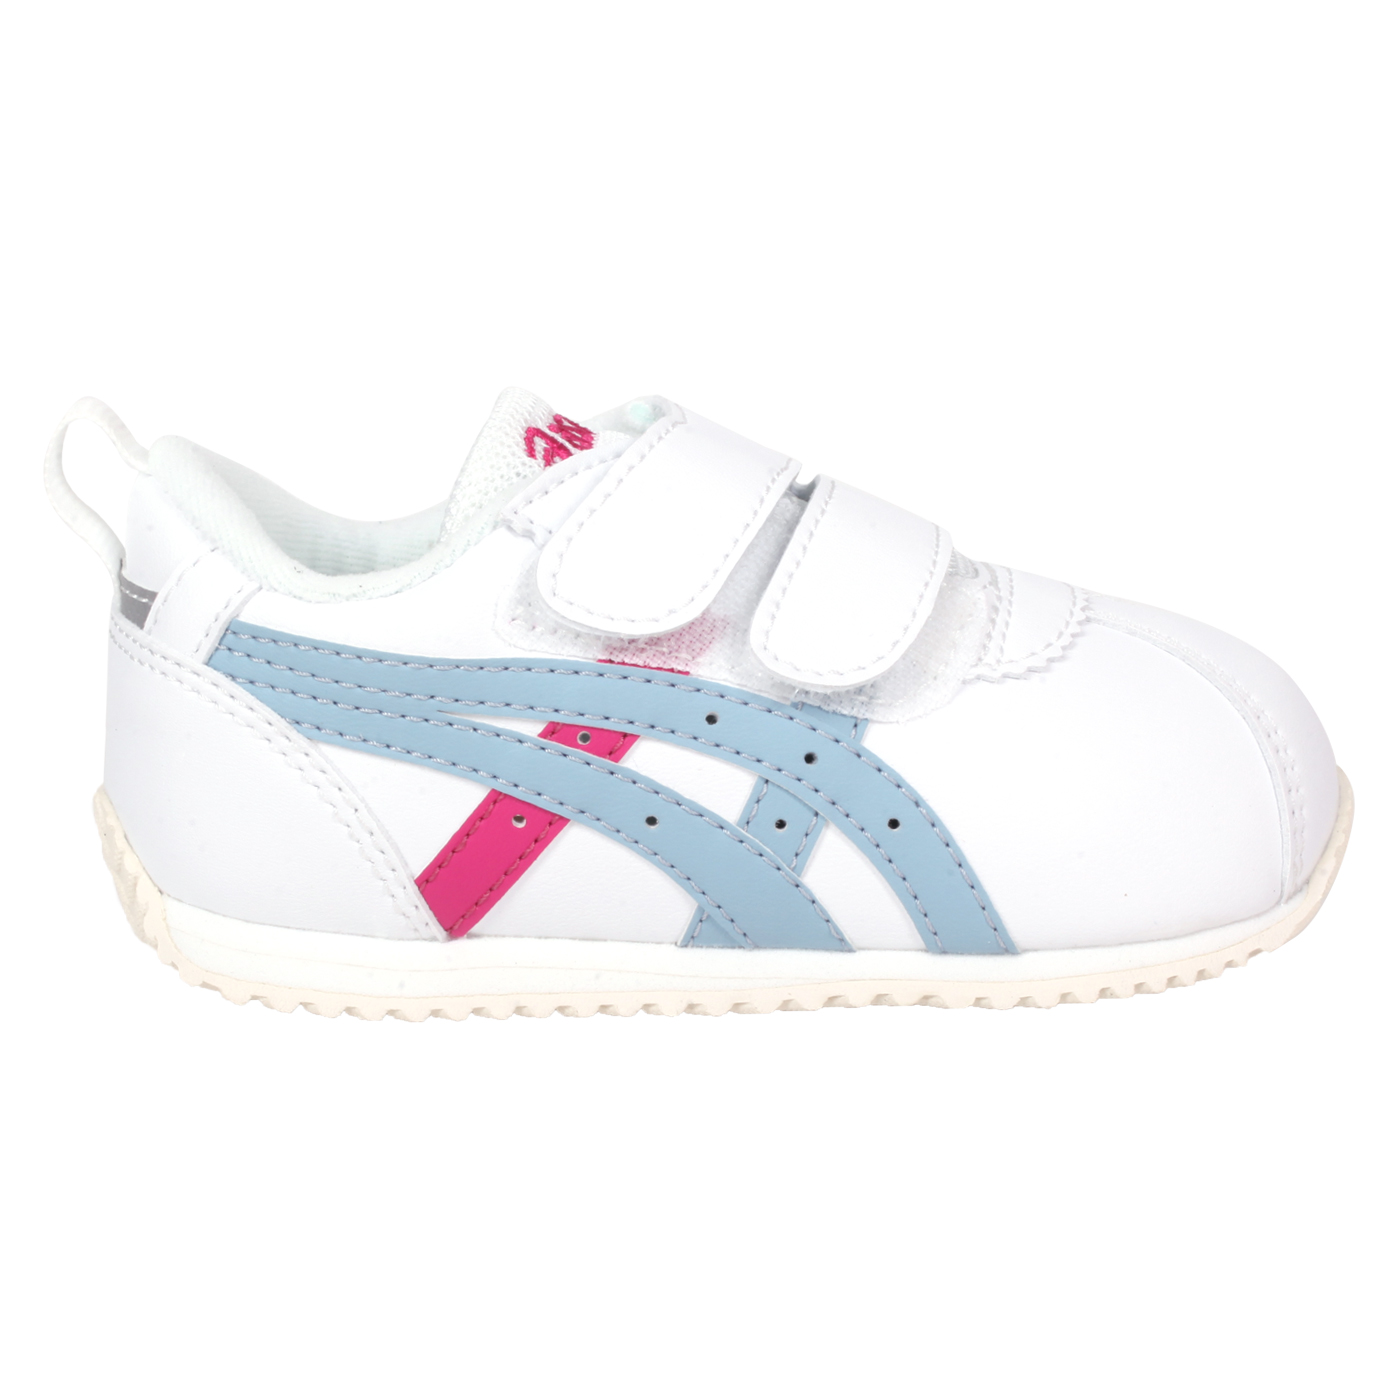 ASICS 小童運動鞋  @CORSAIR BABY SL@1144A210-100 - 白桃紅淺藍